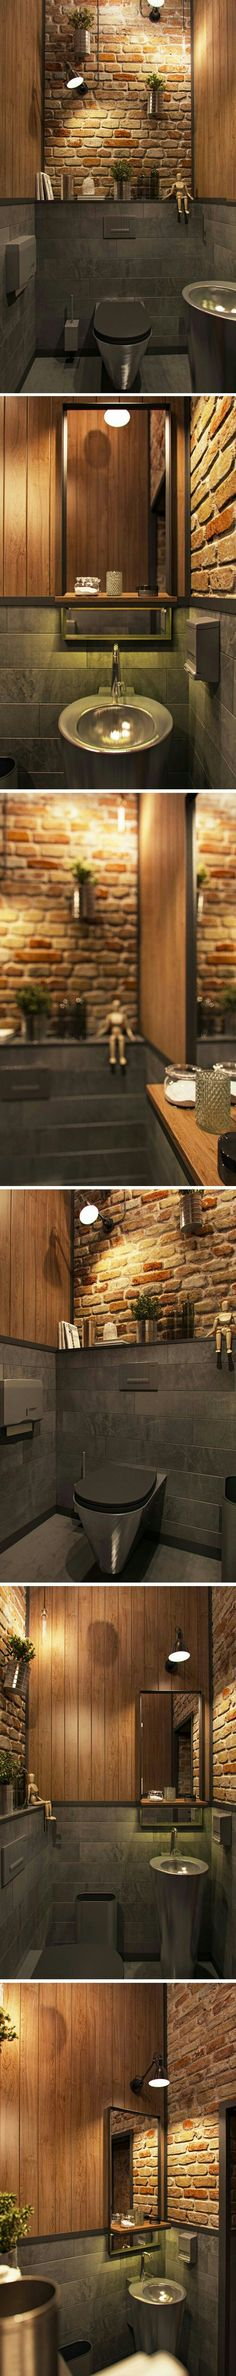 Bath Room Rustic Design Toilets 41 Ideas For 2019 Bathroom Interior Design, Interior Design Living Room, Interior Livingroom, Loft Design, House Design, Bares Y Pubs, Deco Cool, Toilet Room, Small Toilet